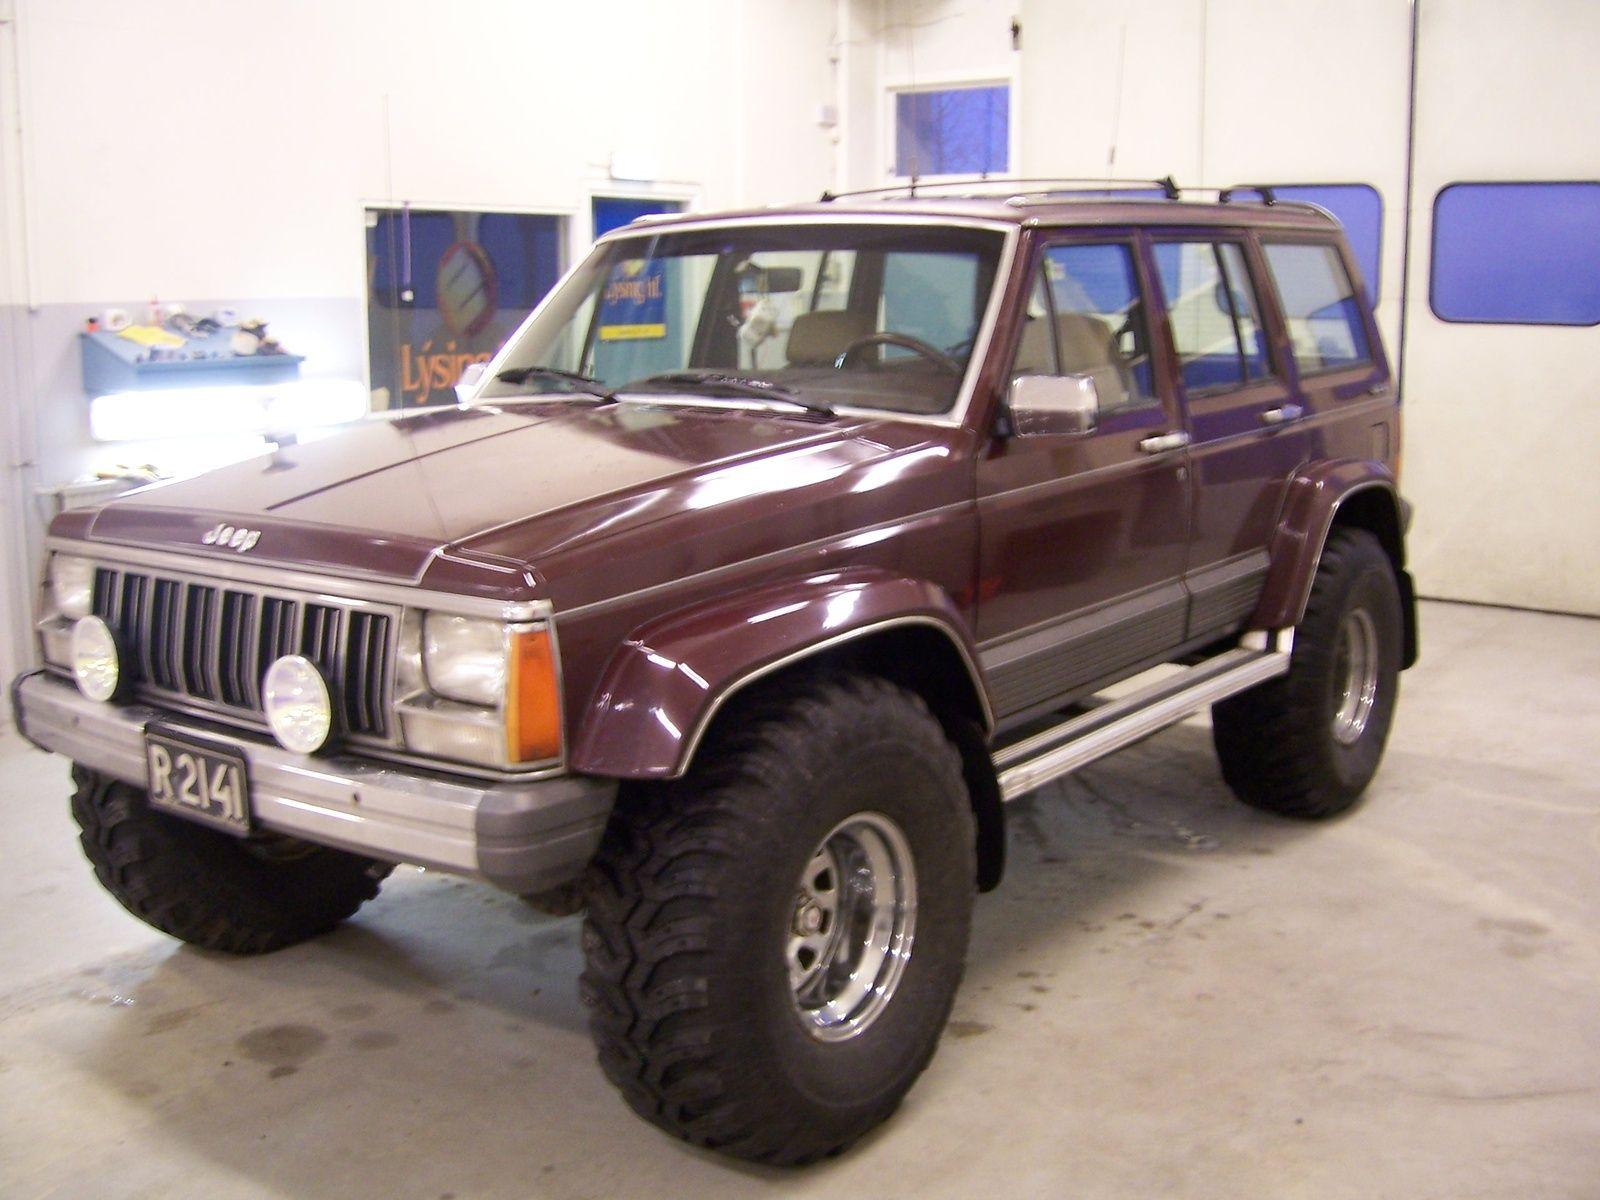 1988 Jeep Xj 33 Tire Modified Wheel Wells Wide Fender Flares